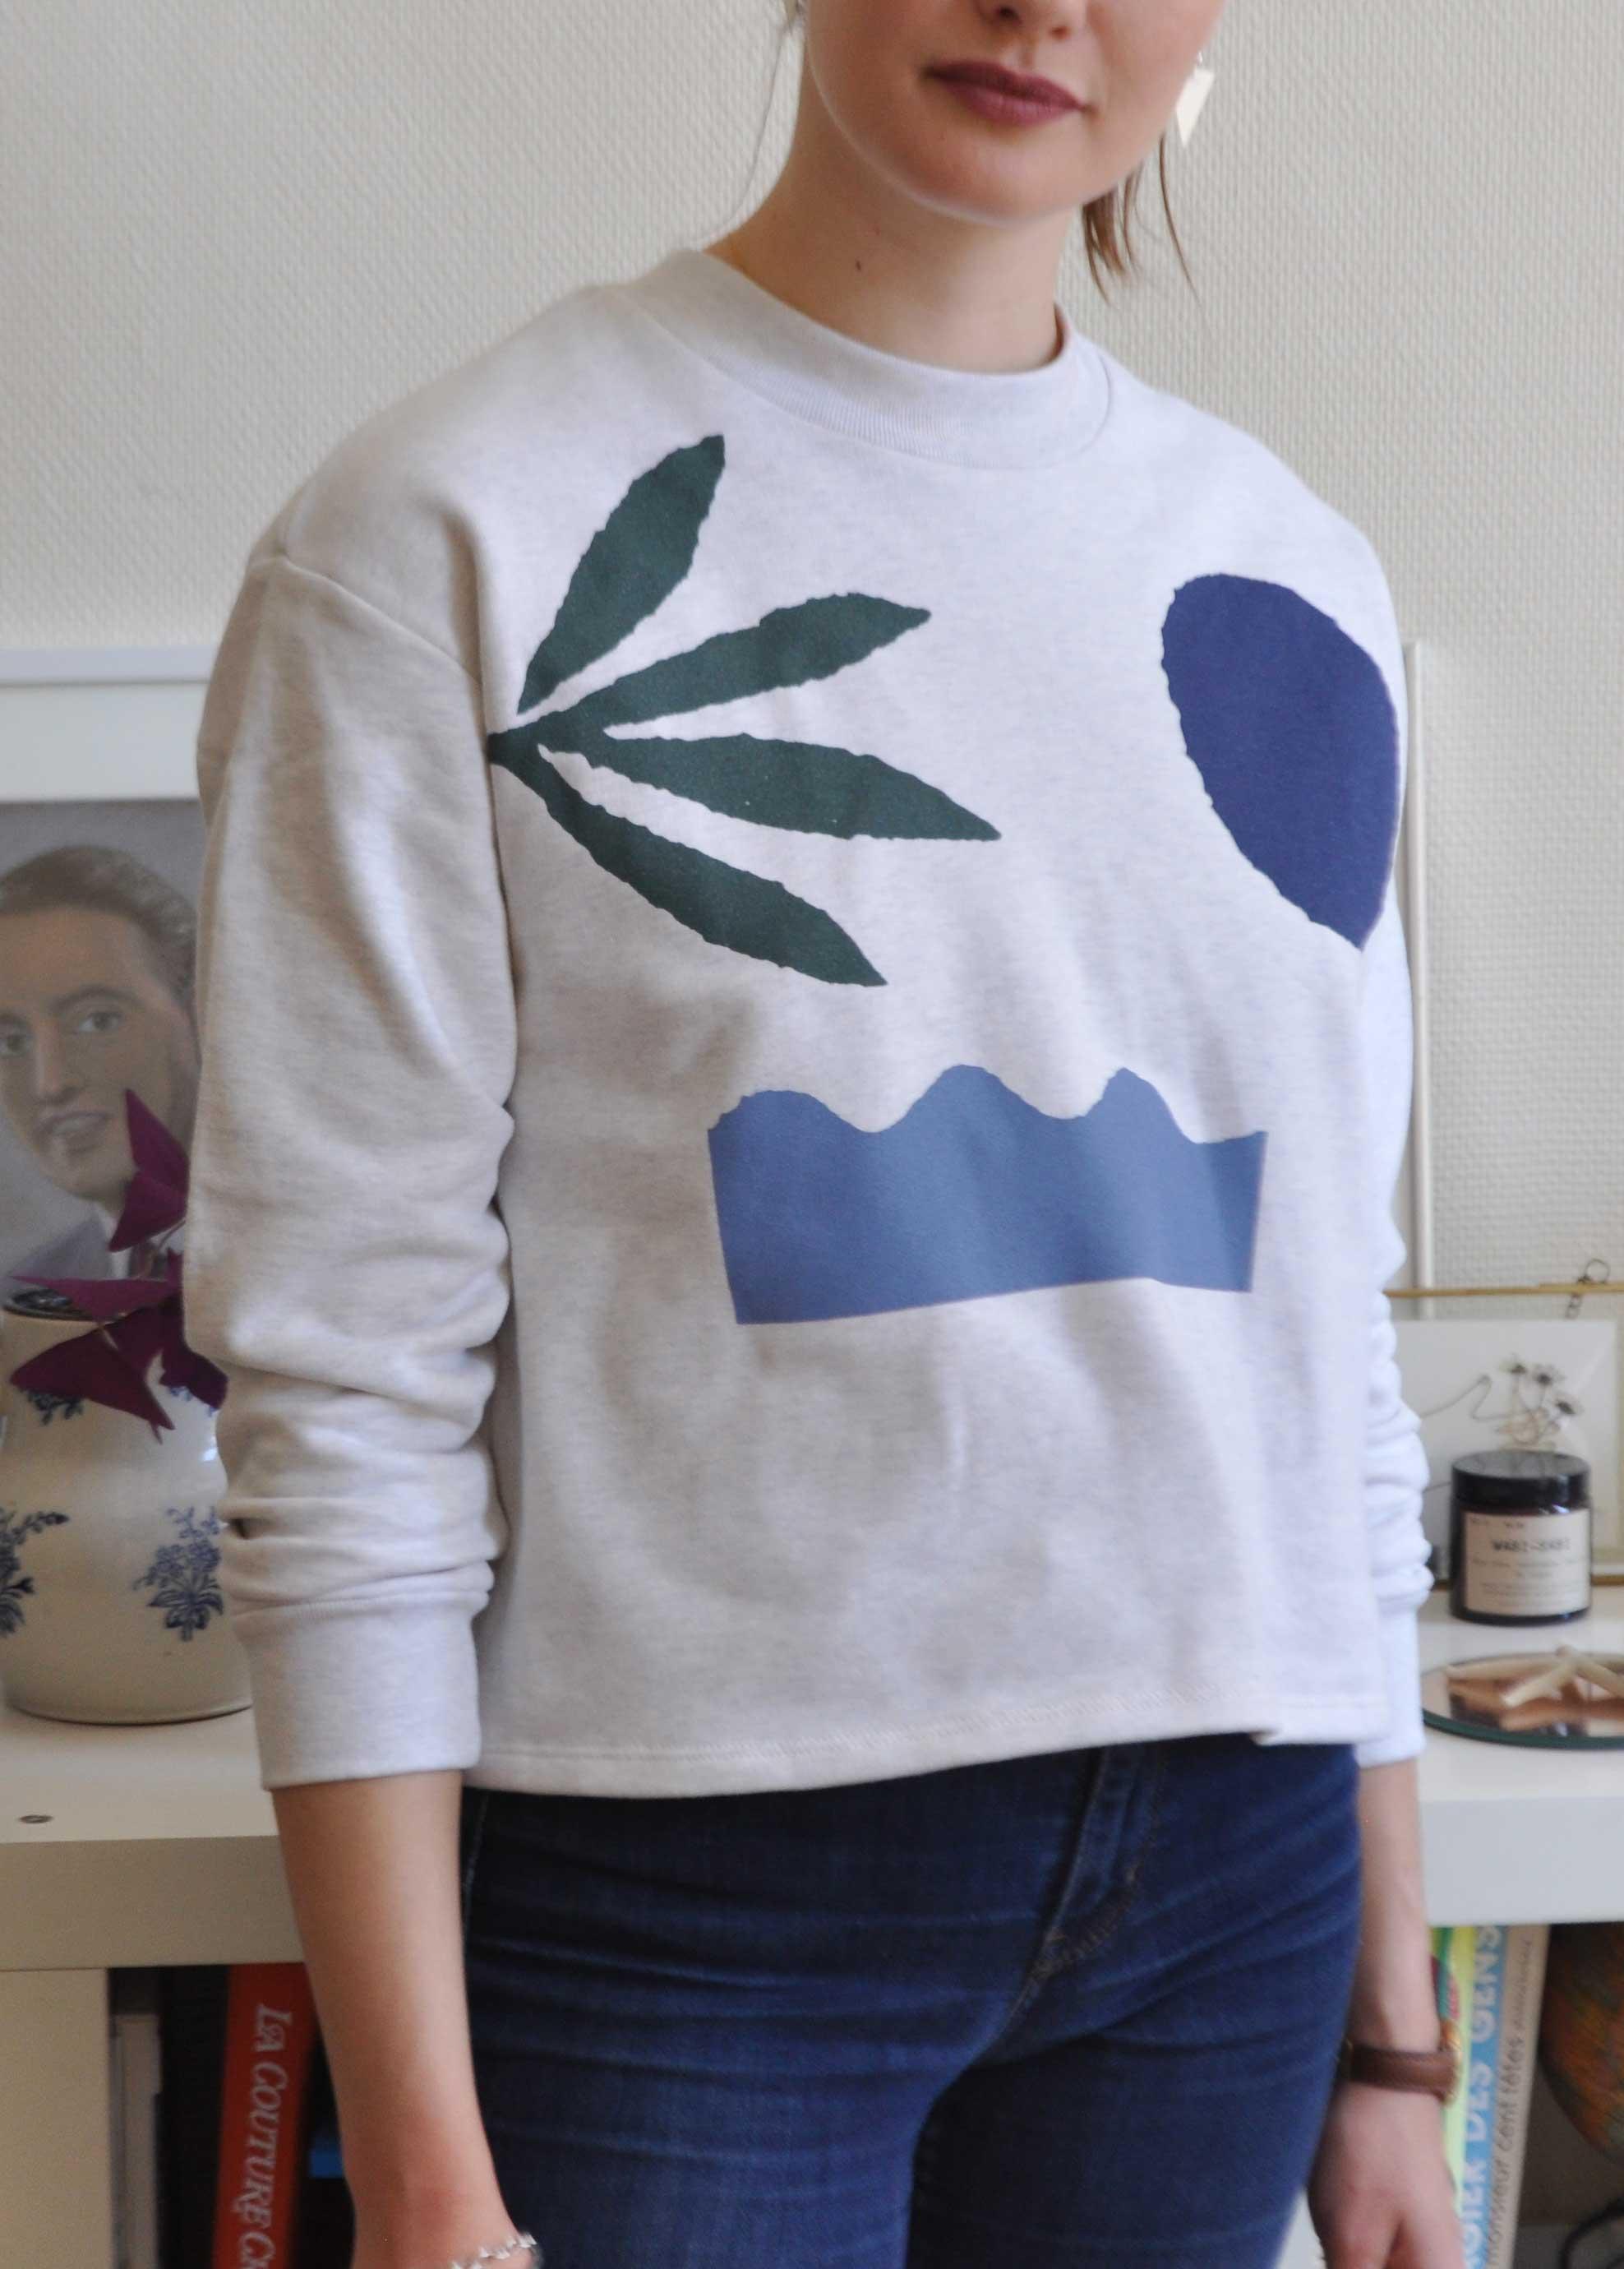 sweatshirt-serigraphie-screenprinting-idealists-dont-stop-2